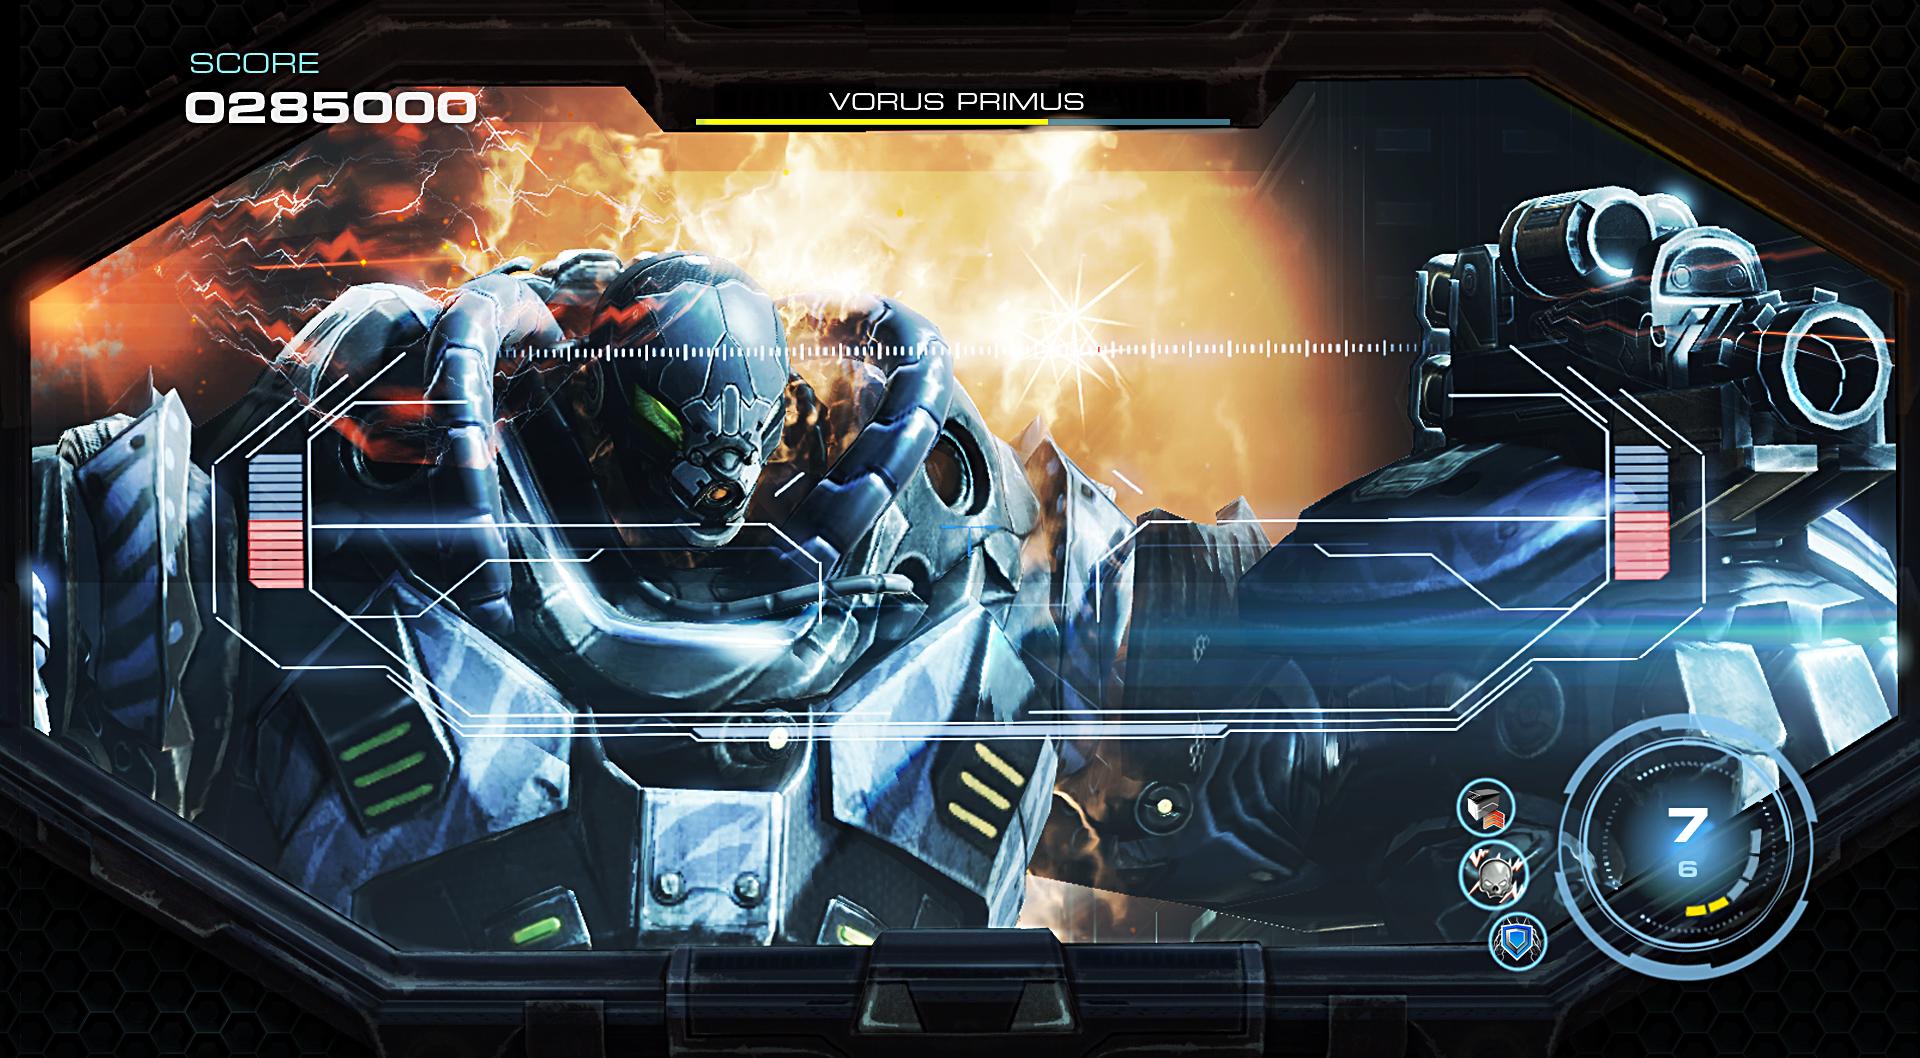 Obrázky z inFamous, NFS: Rivals, FIFA 14, Alien Rage 86388